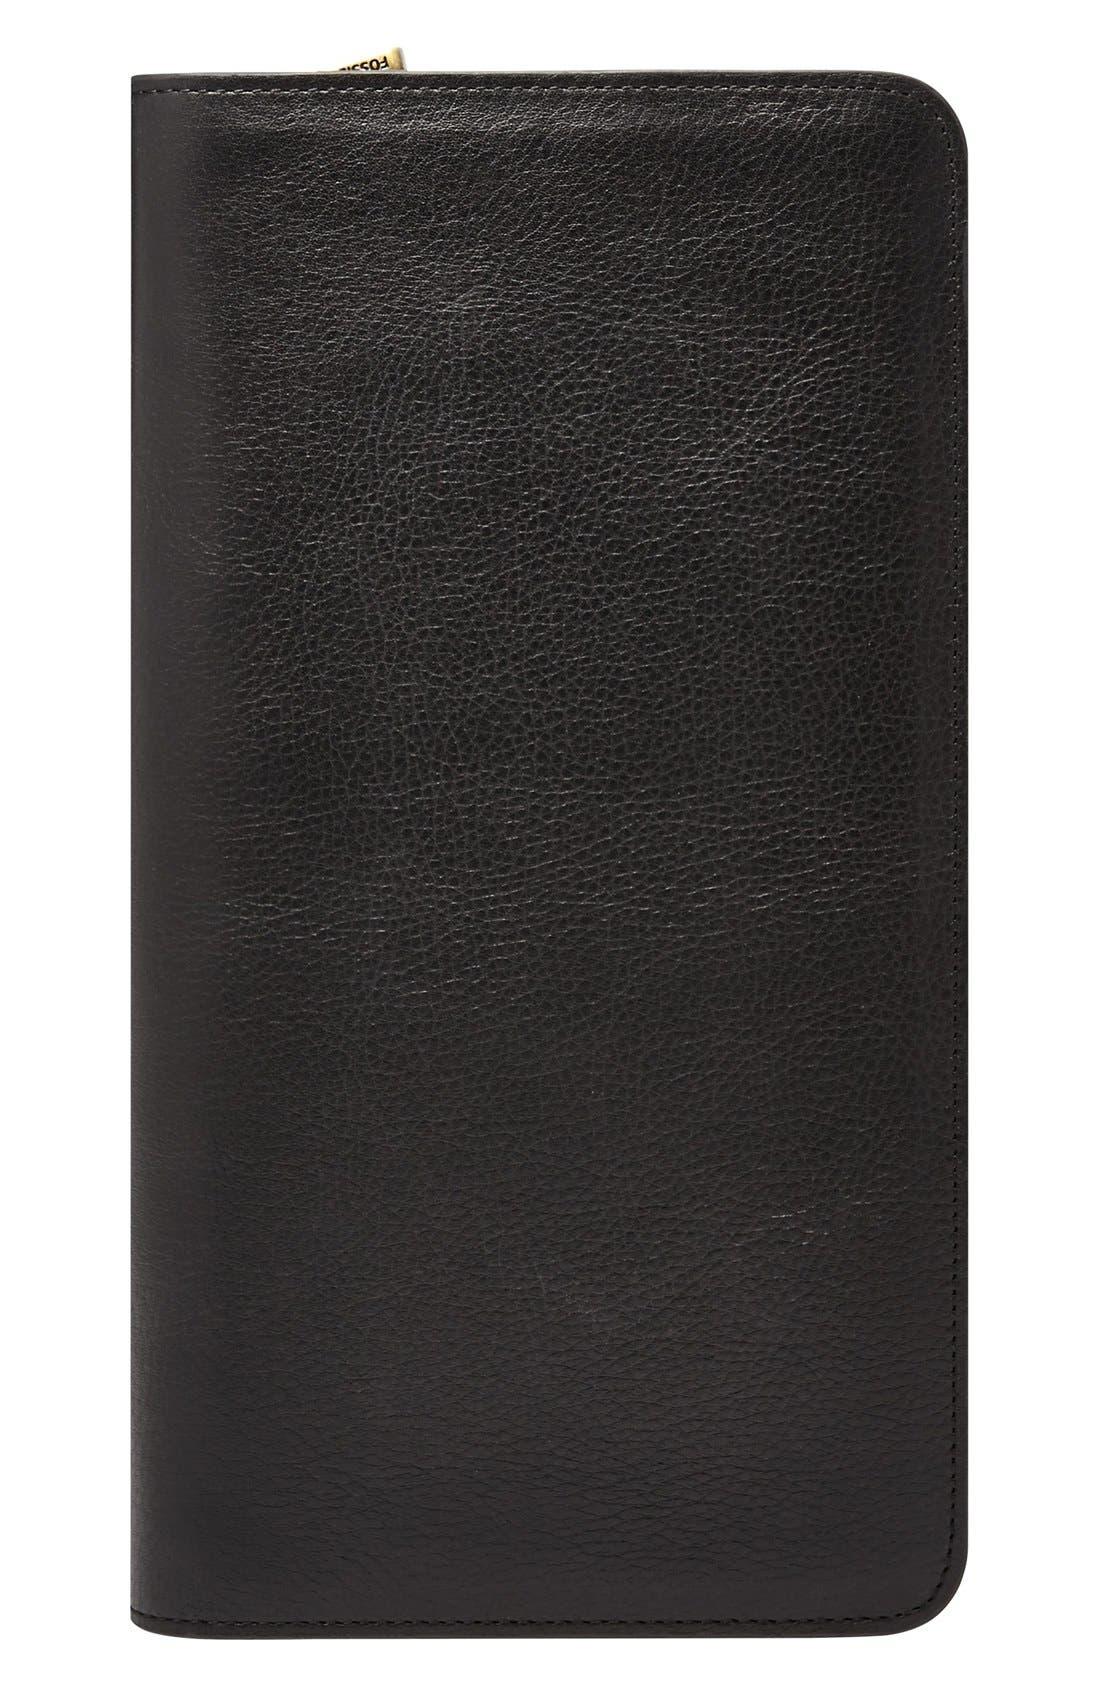 FOSSIL, Leather Zip Passport Case, Main thumbnail 1, color, BLACK